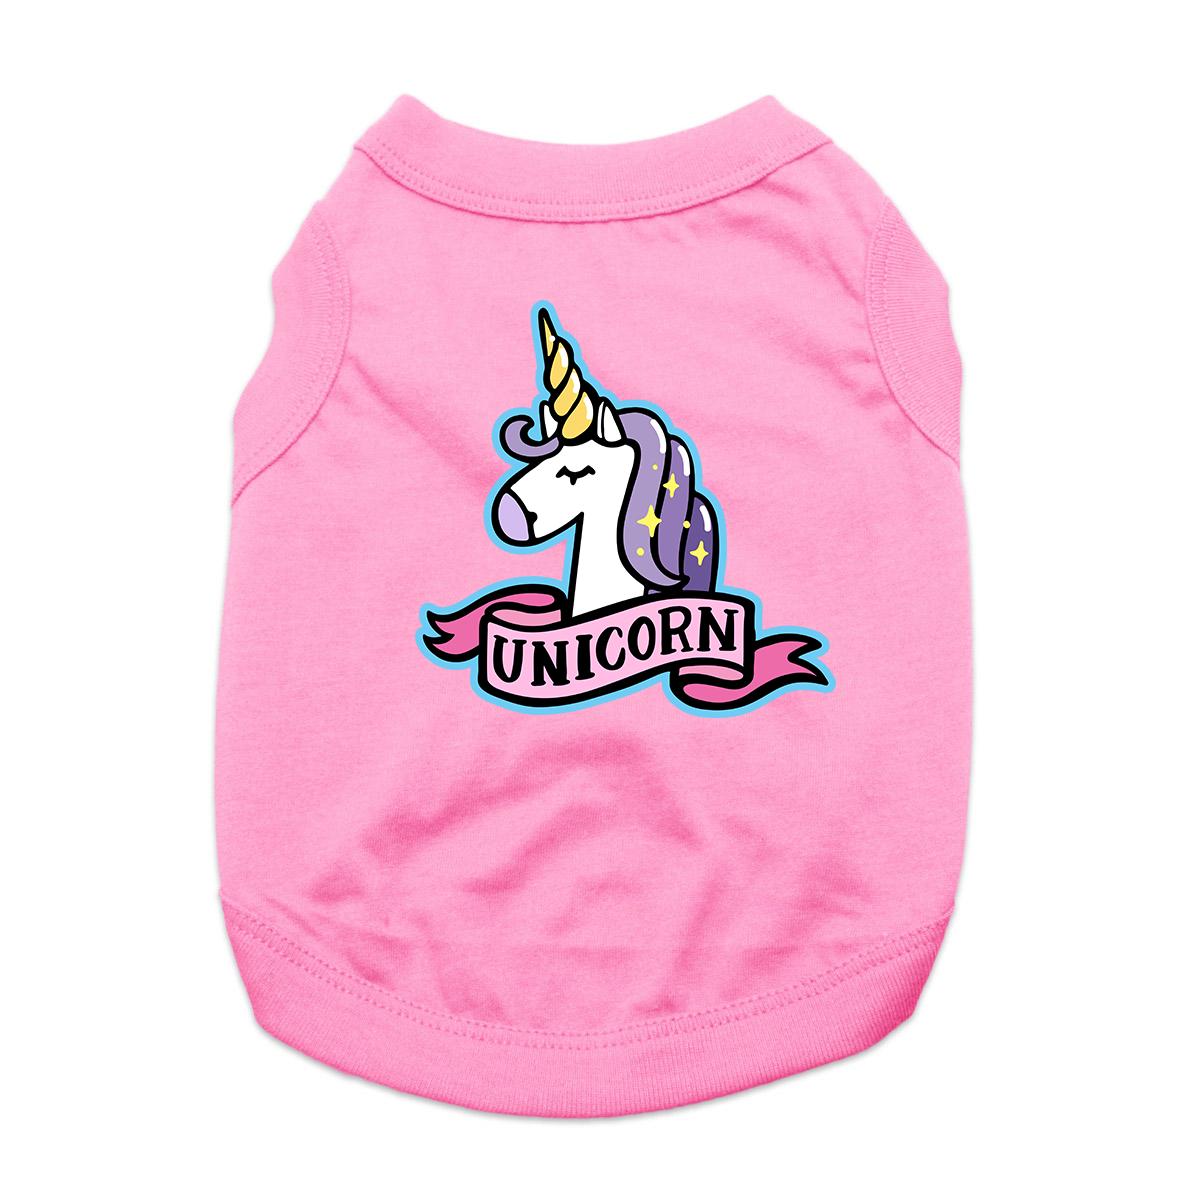 Unicorn Dog Shirt - Pink